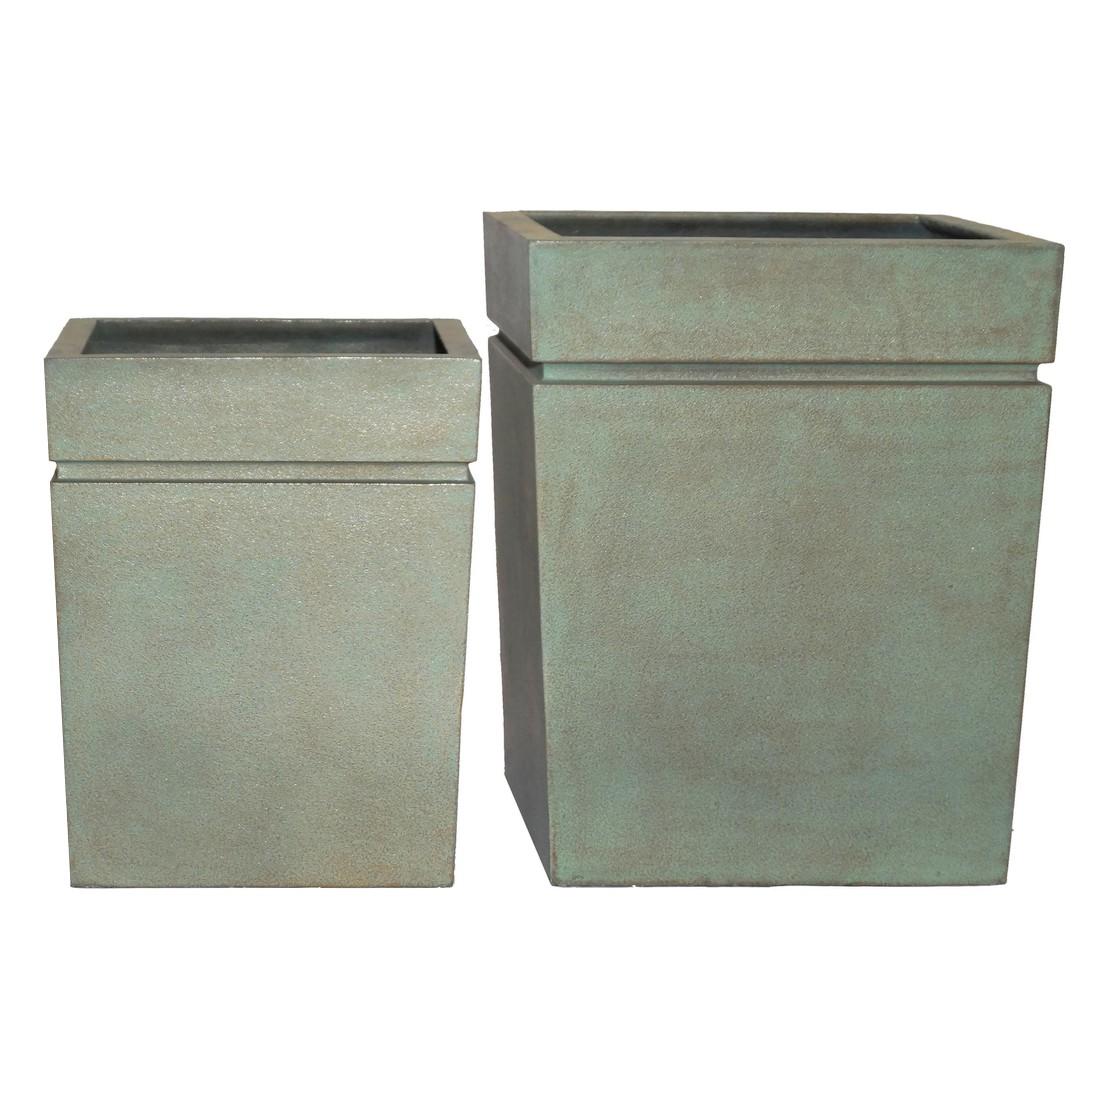 Pflanzkübel Copper Green – Kunststoff – Modern Eckig – Normal – 2er-Set, Viducci's Garden günstig